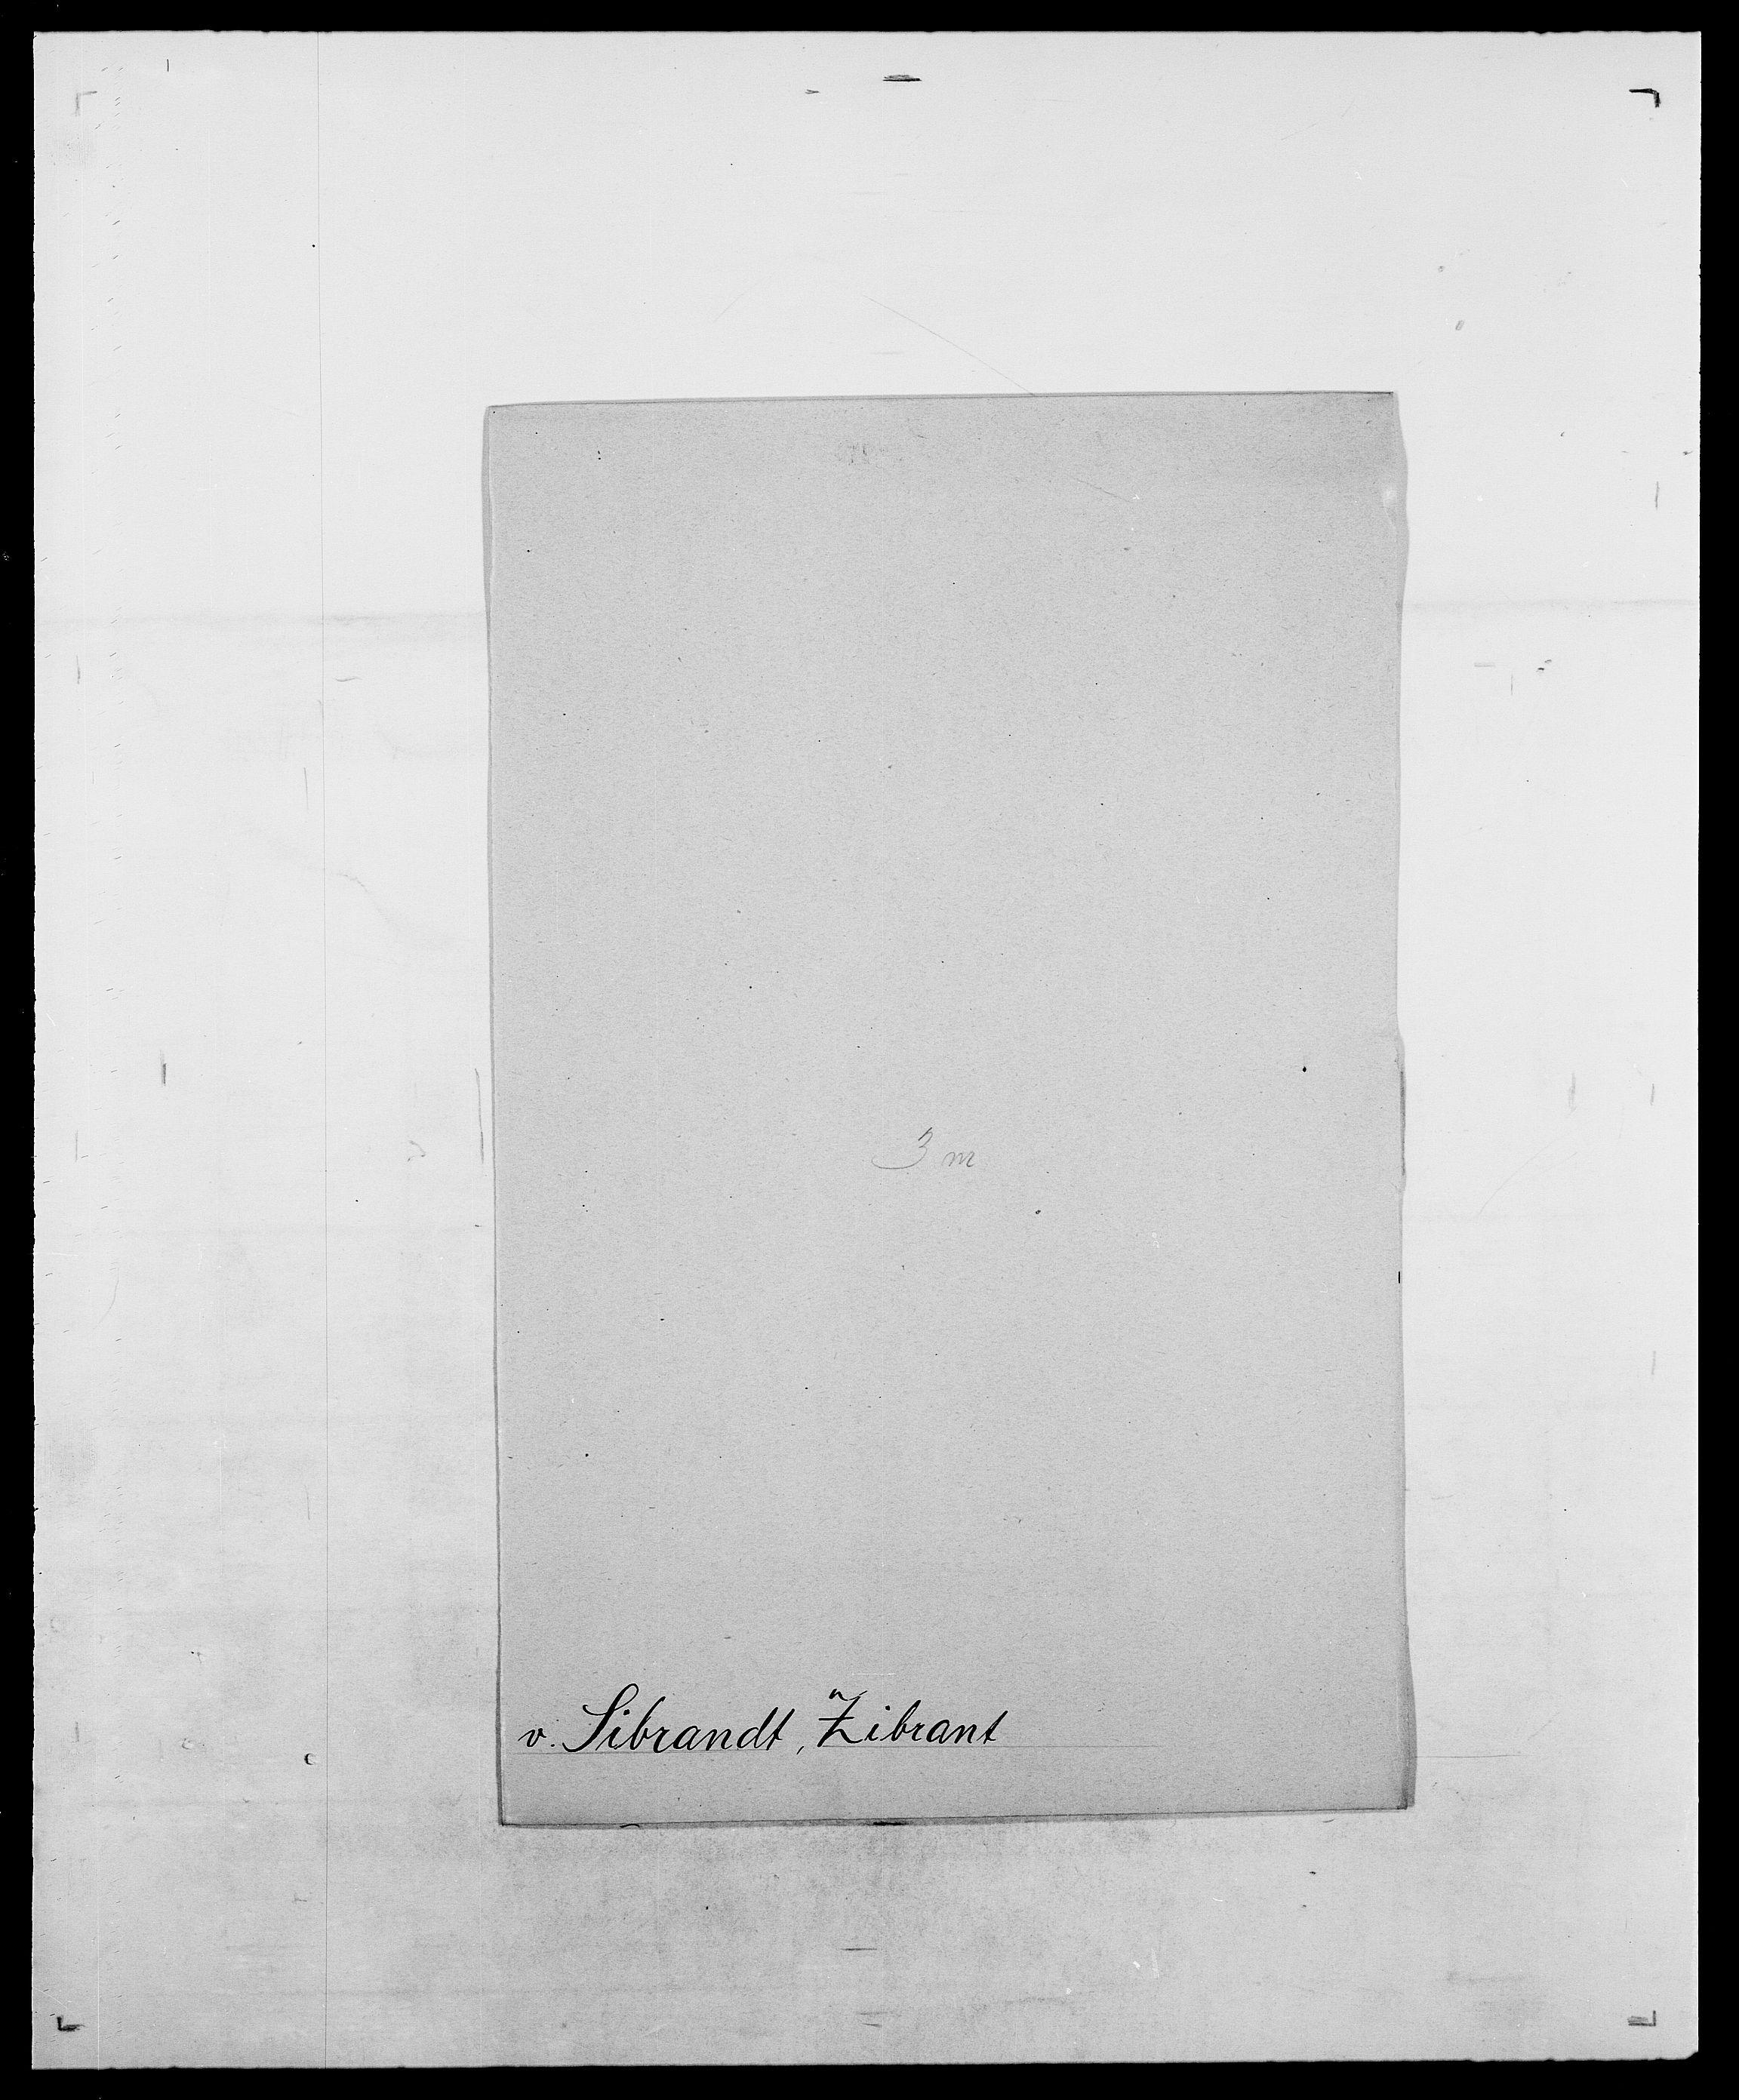 SAO, Delgobe, Charles Antoine - samling, D/Da/L0035: Schnabel - sjetman, s. 750